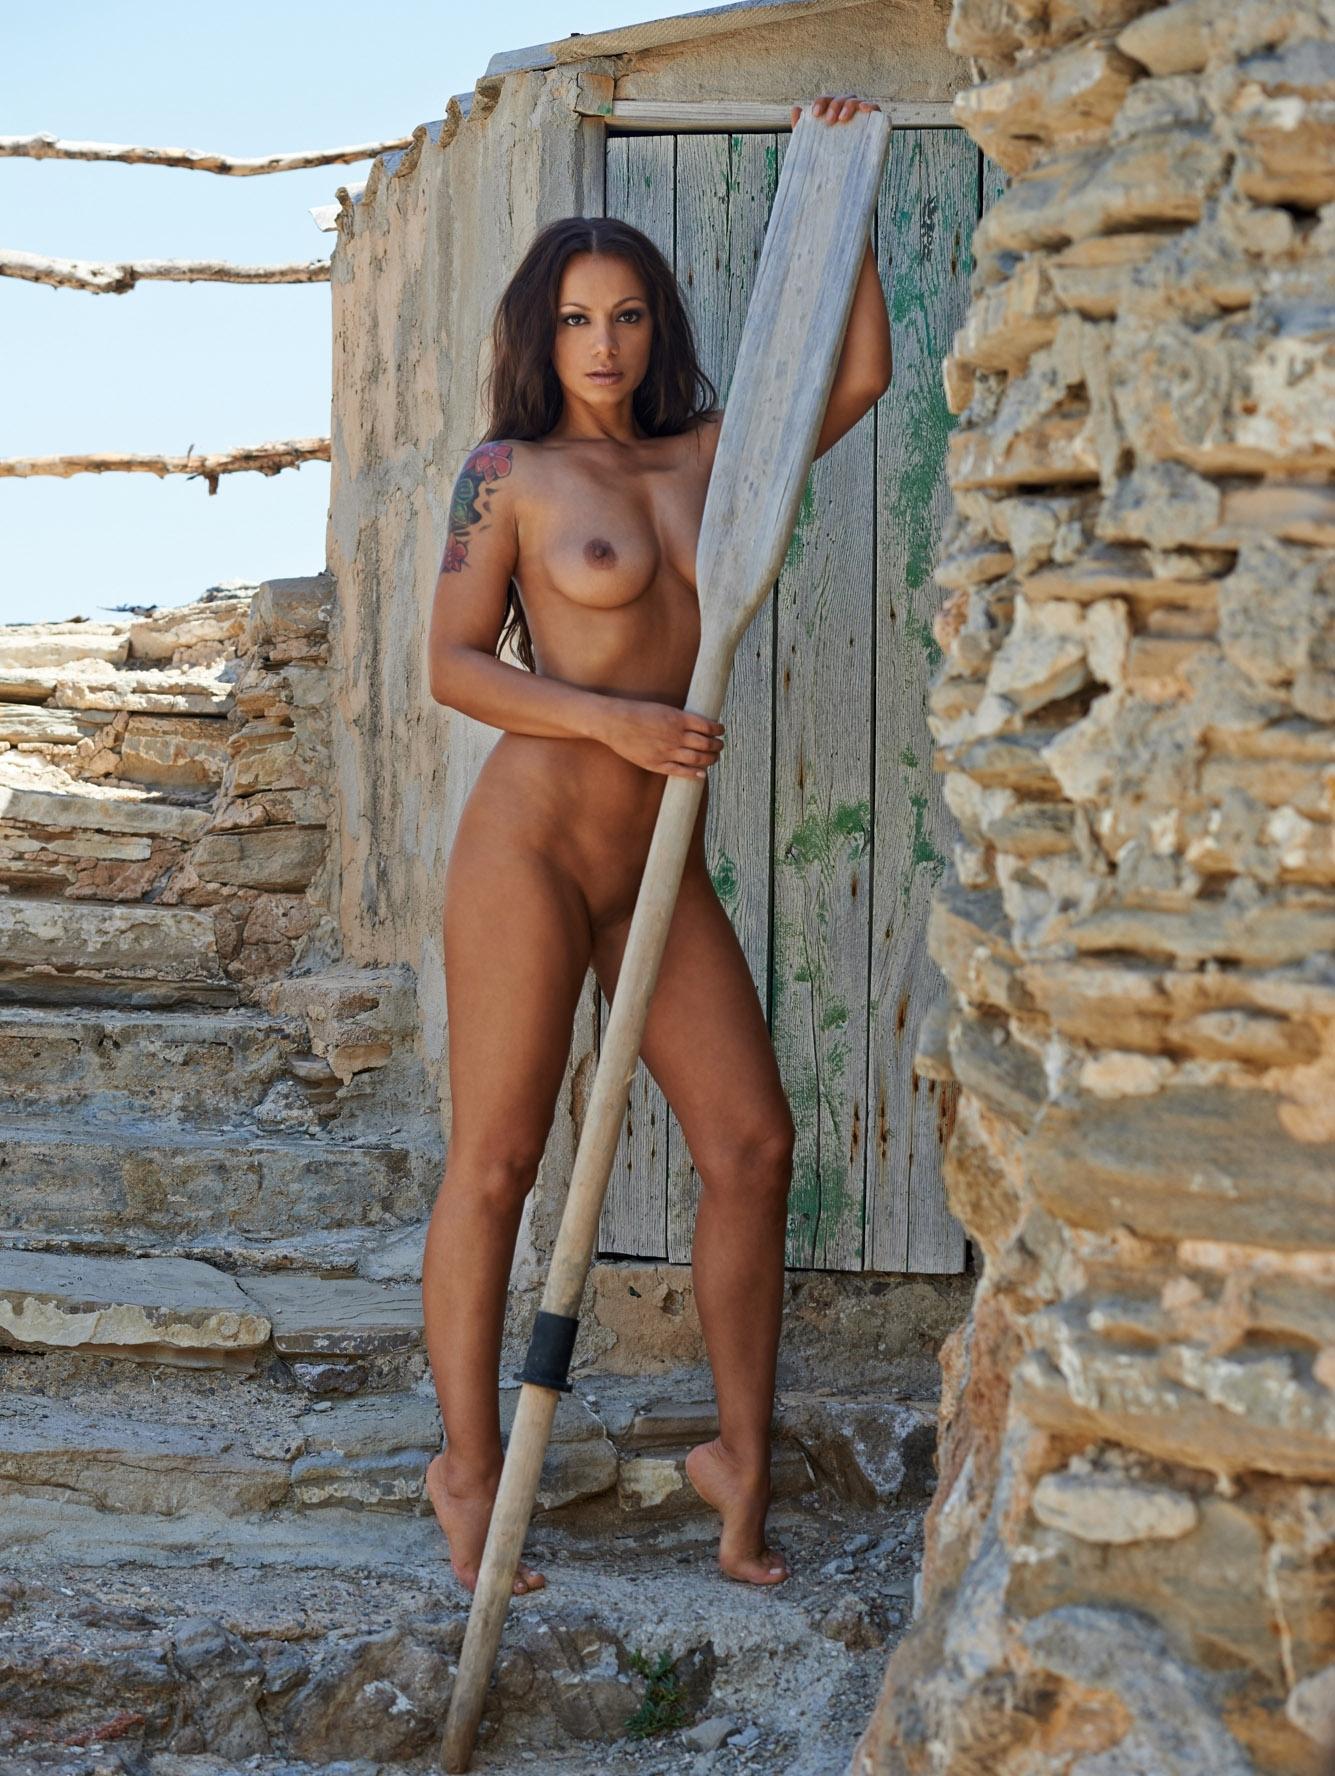 Радост Бокель голая. Фото - 1